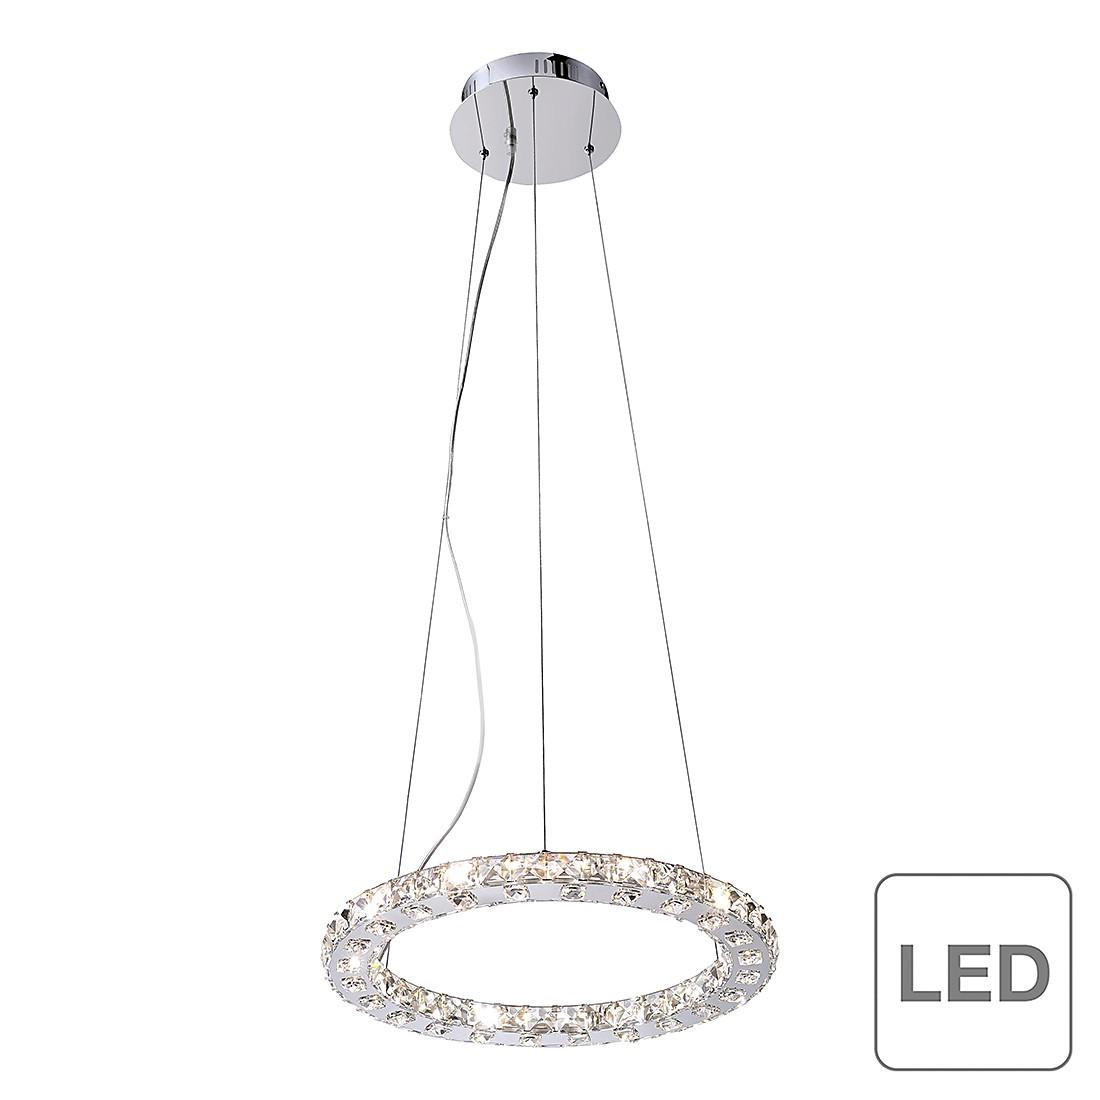 EEK A+, LED-Pendelleuchte Jola - Chrom/ Kristall - Silber, Paul Neuhaus